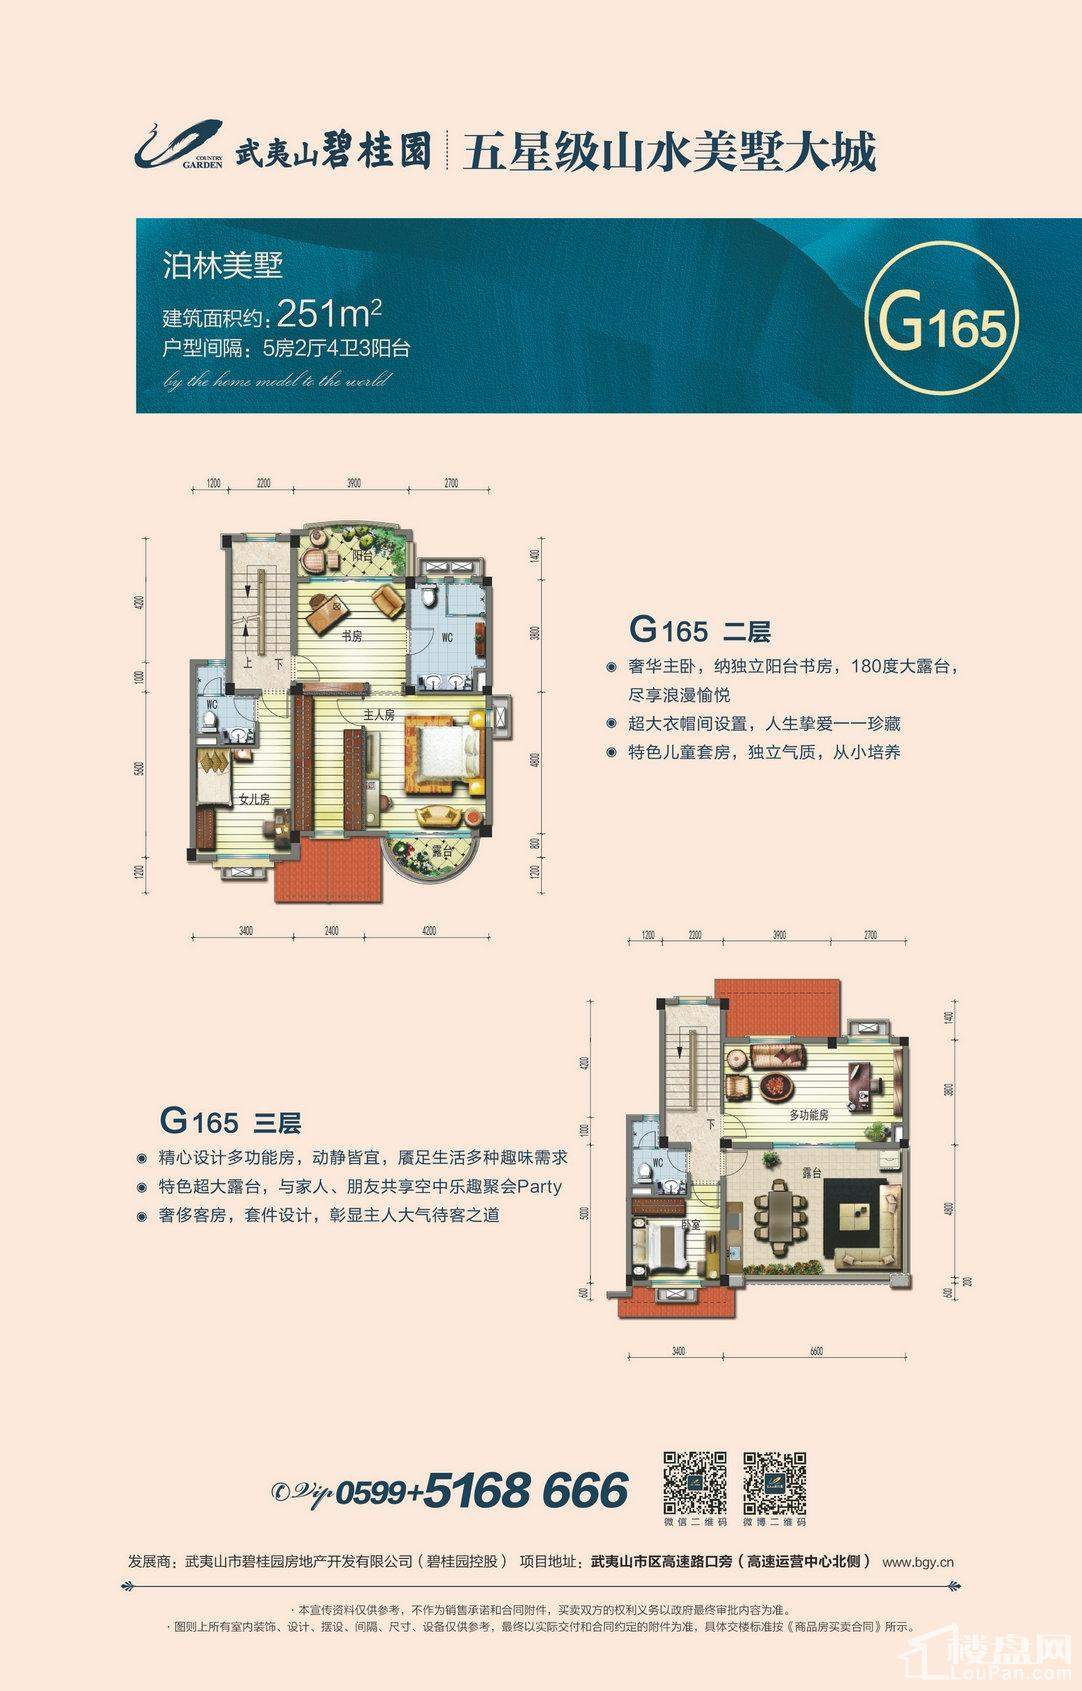 G165-2 泊林美墅